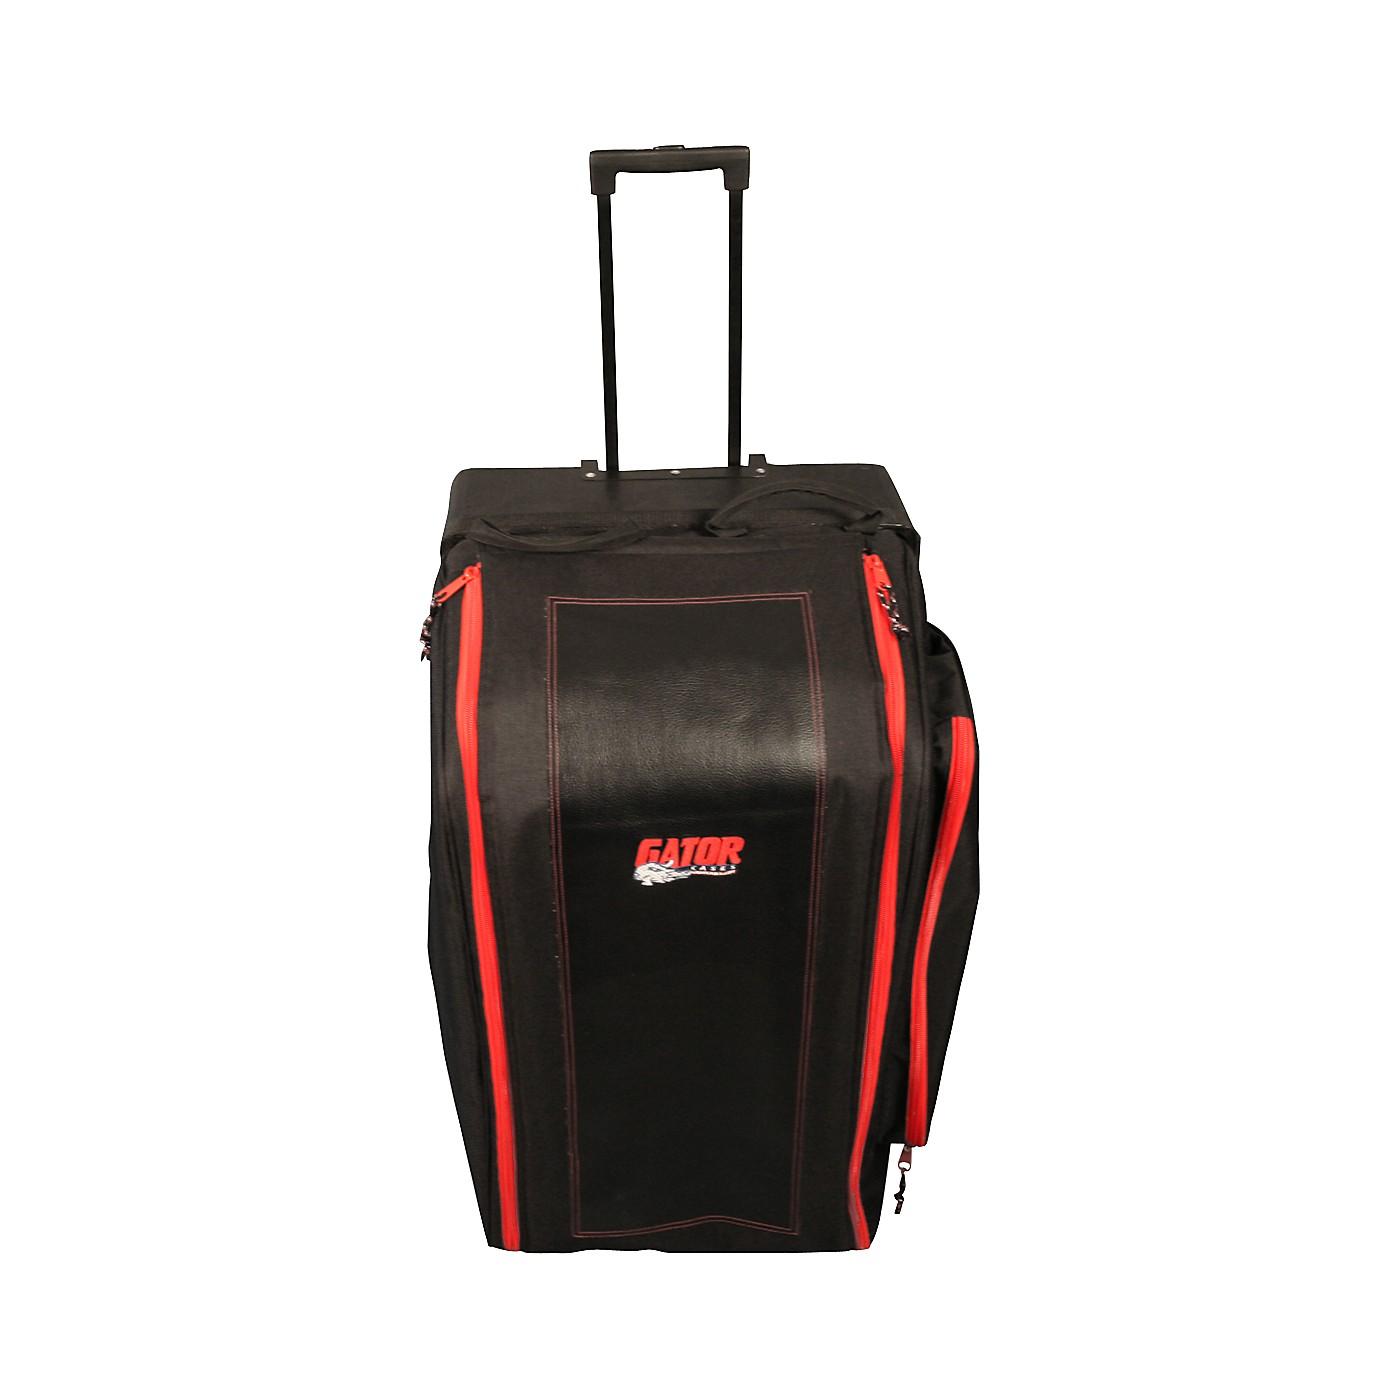 Gator GPA-777 Heavy-Duty Speaker Bag thumbnail